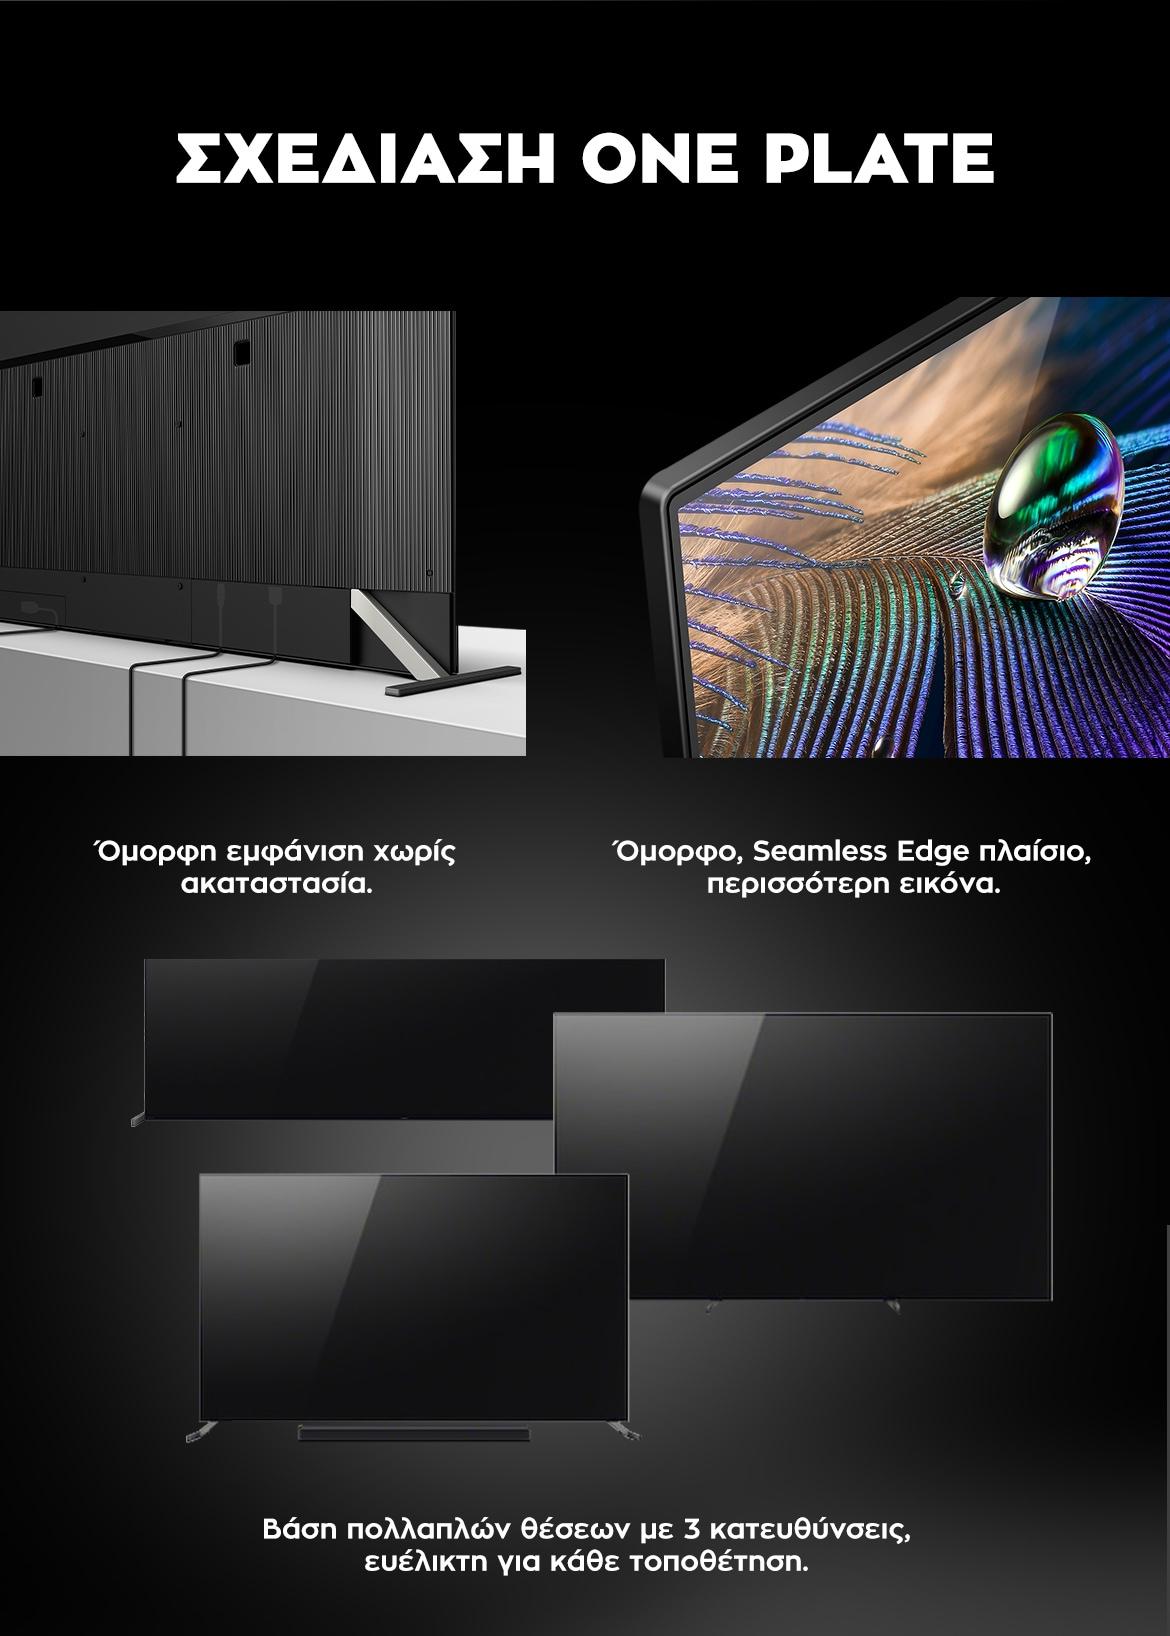 SONY Bravia XR OLED - Σχεδίαση one plate